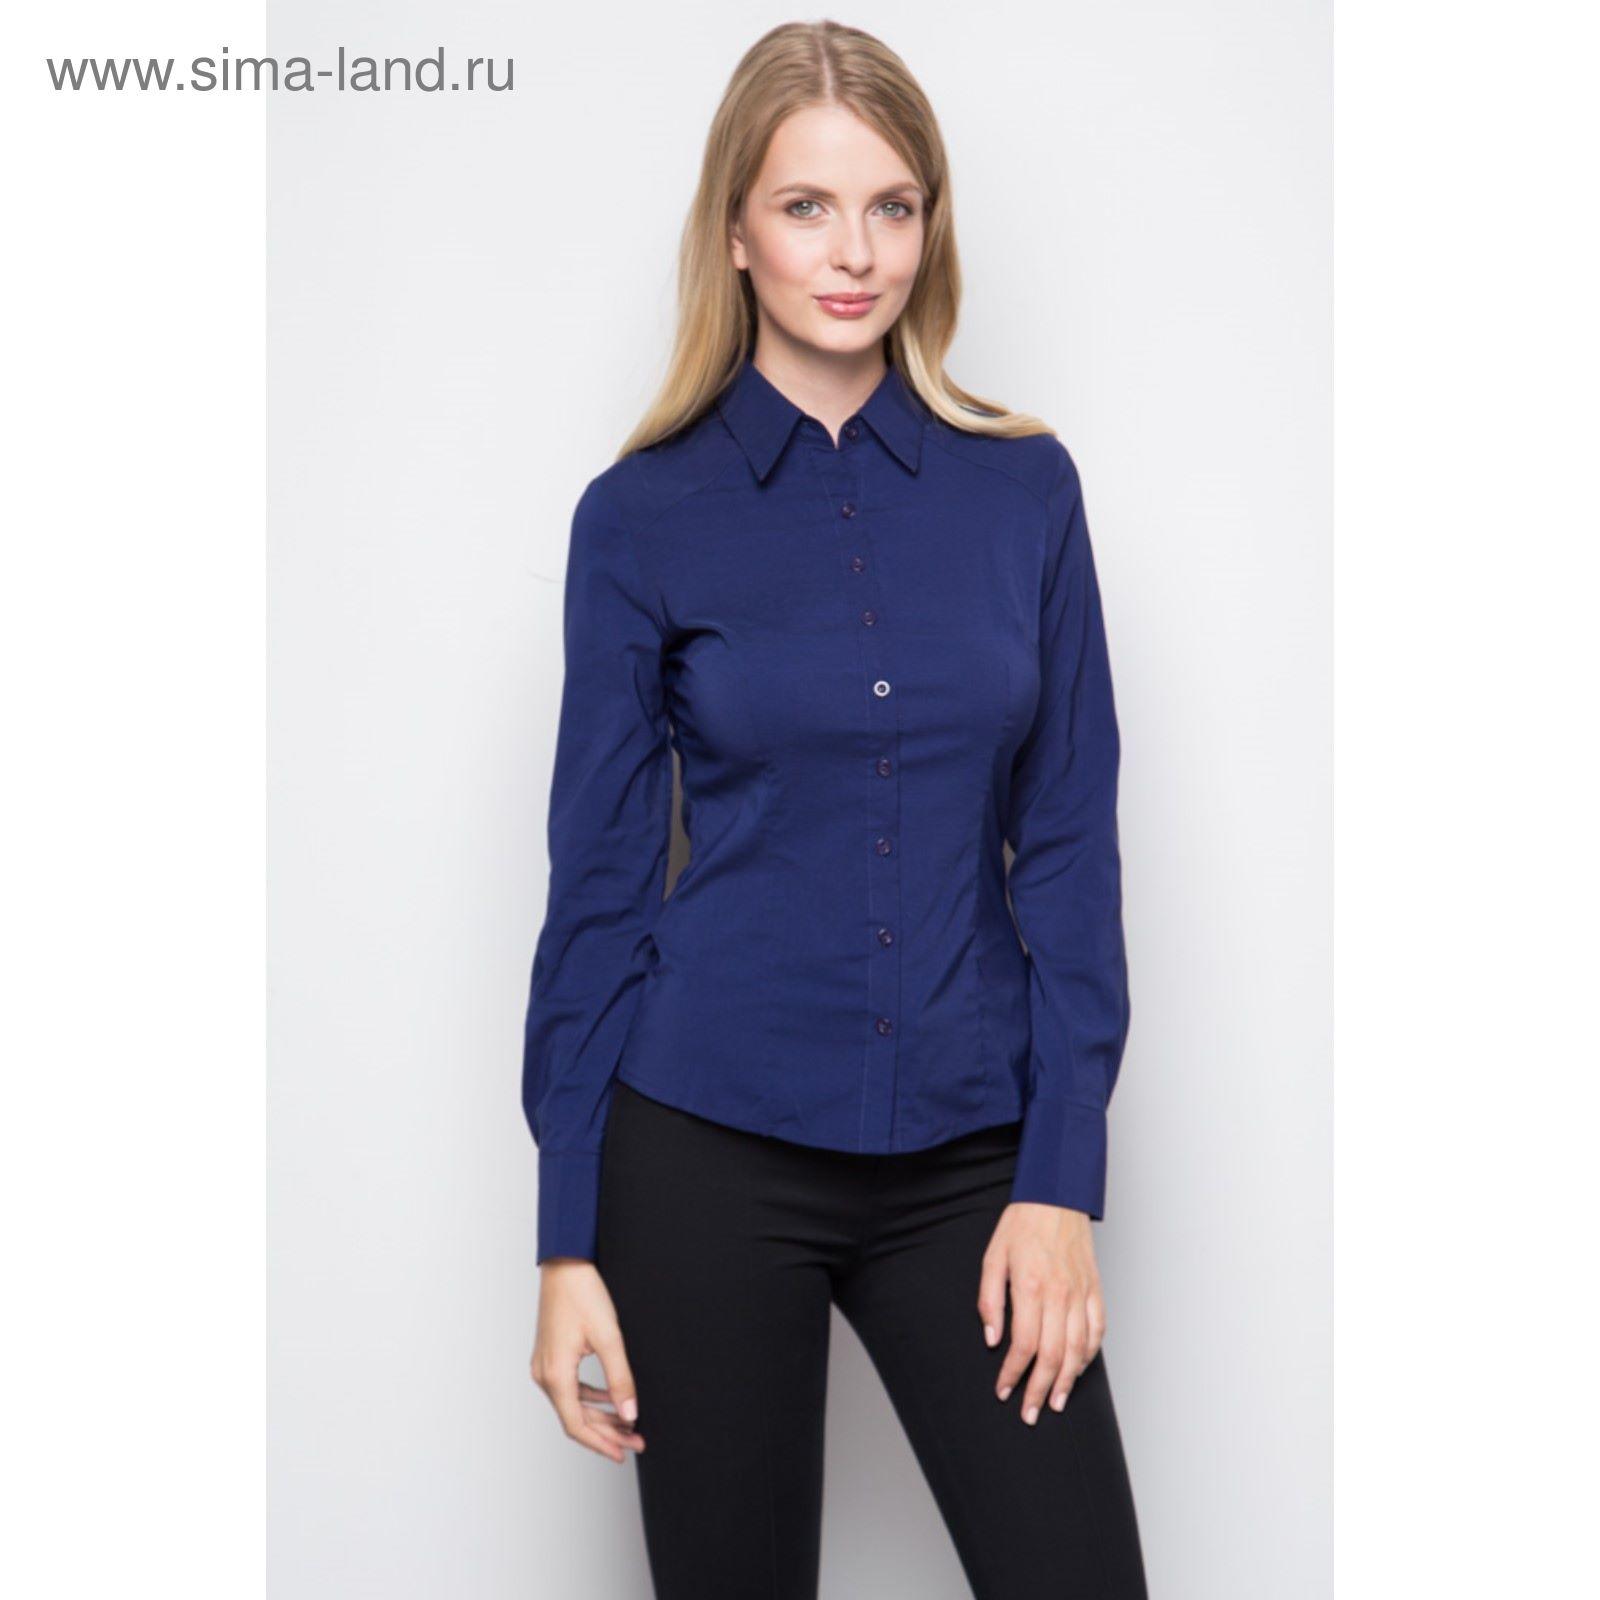 85a31d7e65a Рубашка женская